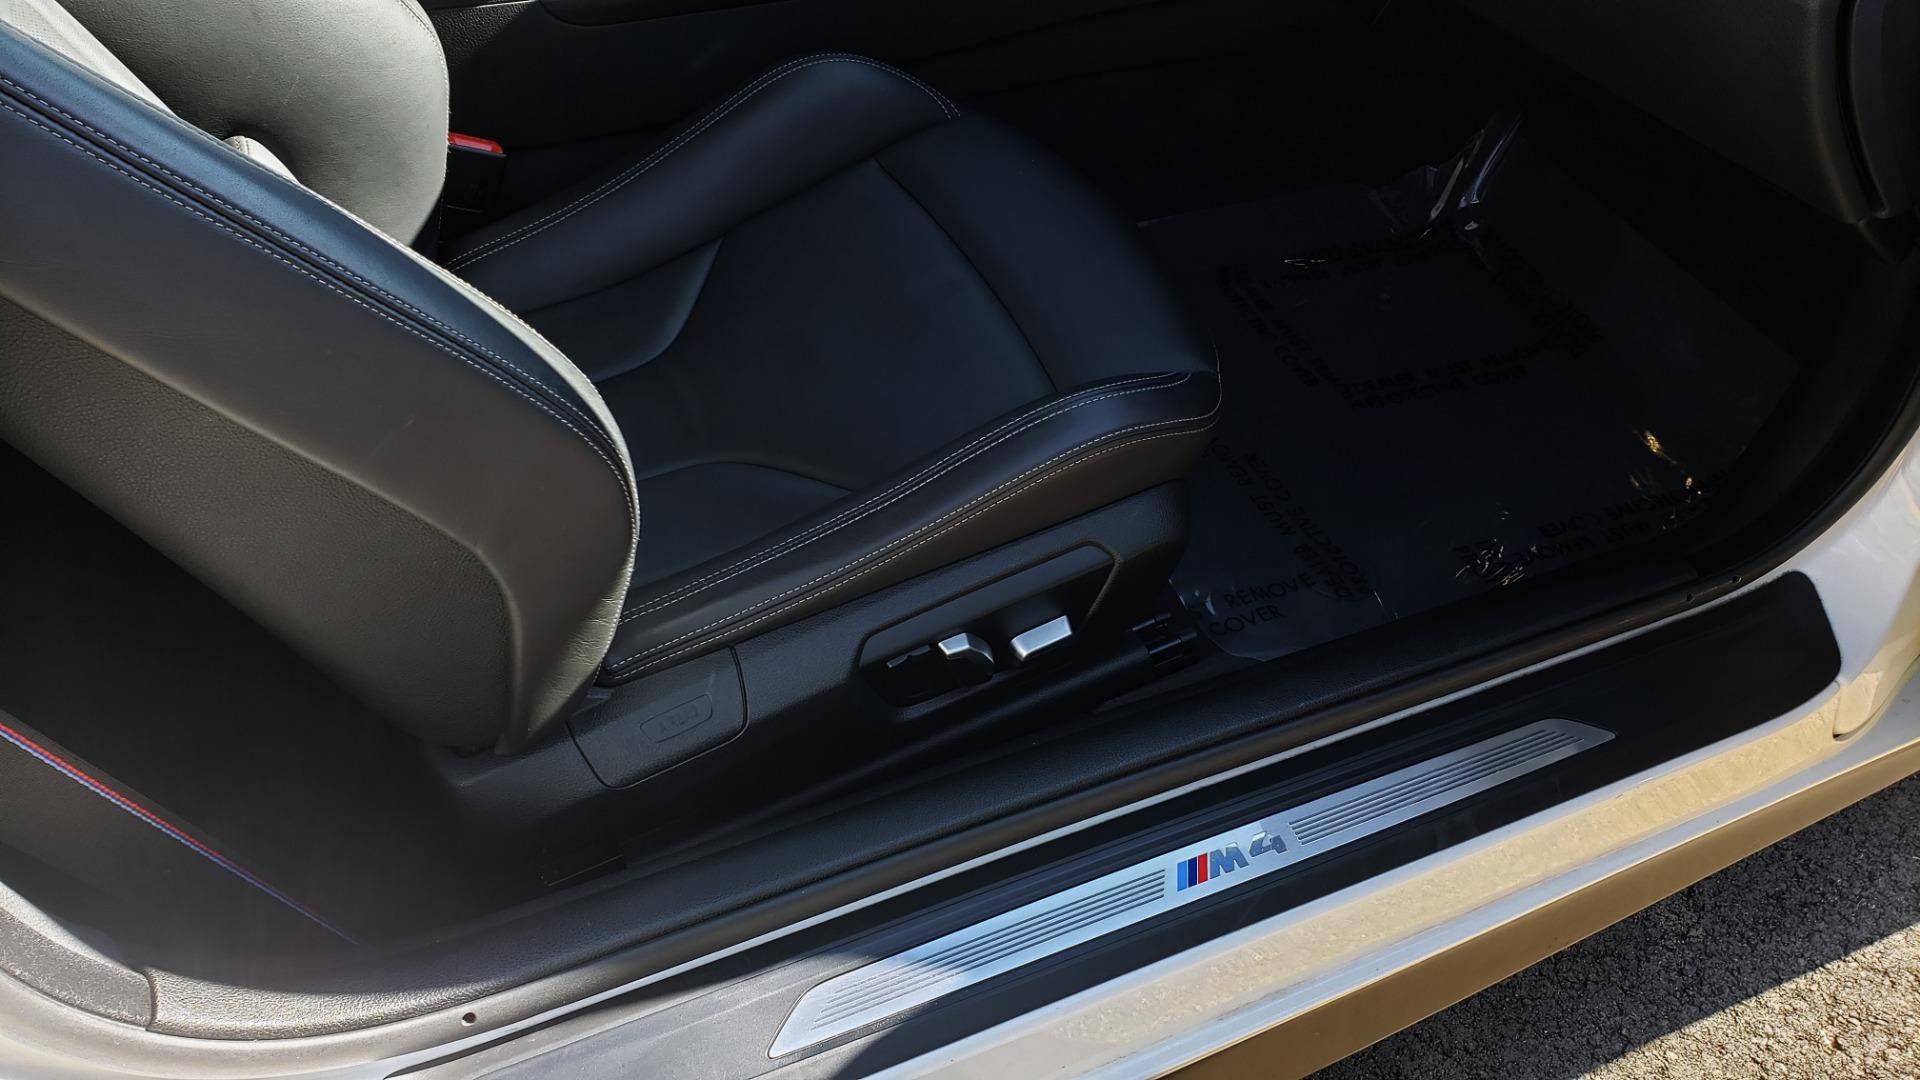 Used 2018 BMW M4 COMP PKG / EXEC / M-DRIVER / PARK CNTRL / ACTIVE BLIND SPOT for sale $45,449 at Formula Imports in Charlotte NC 28227 67